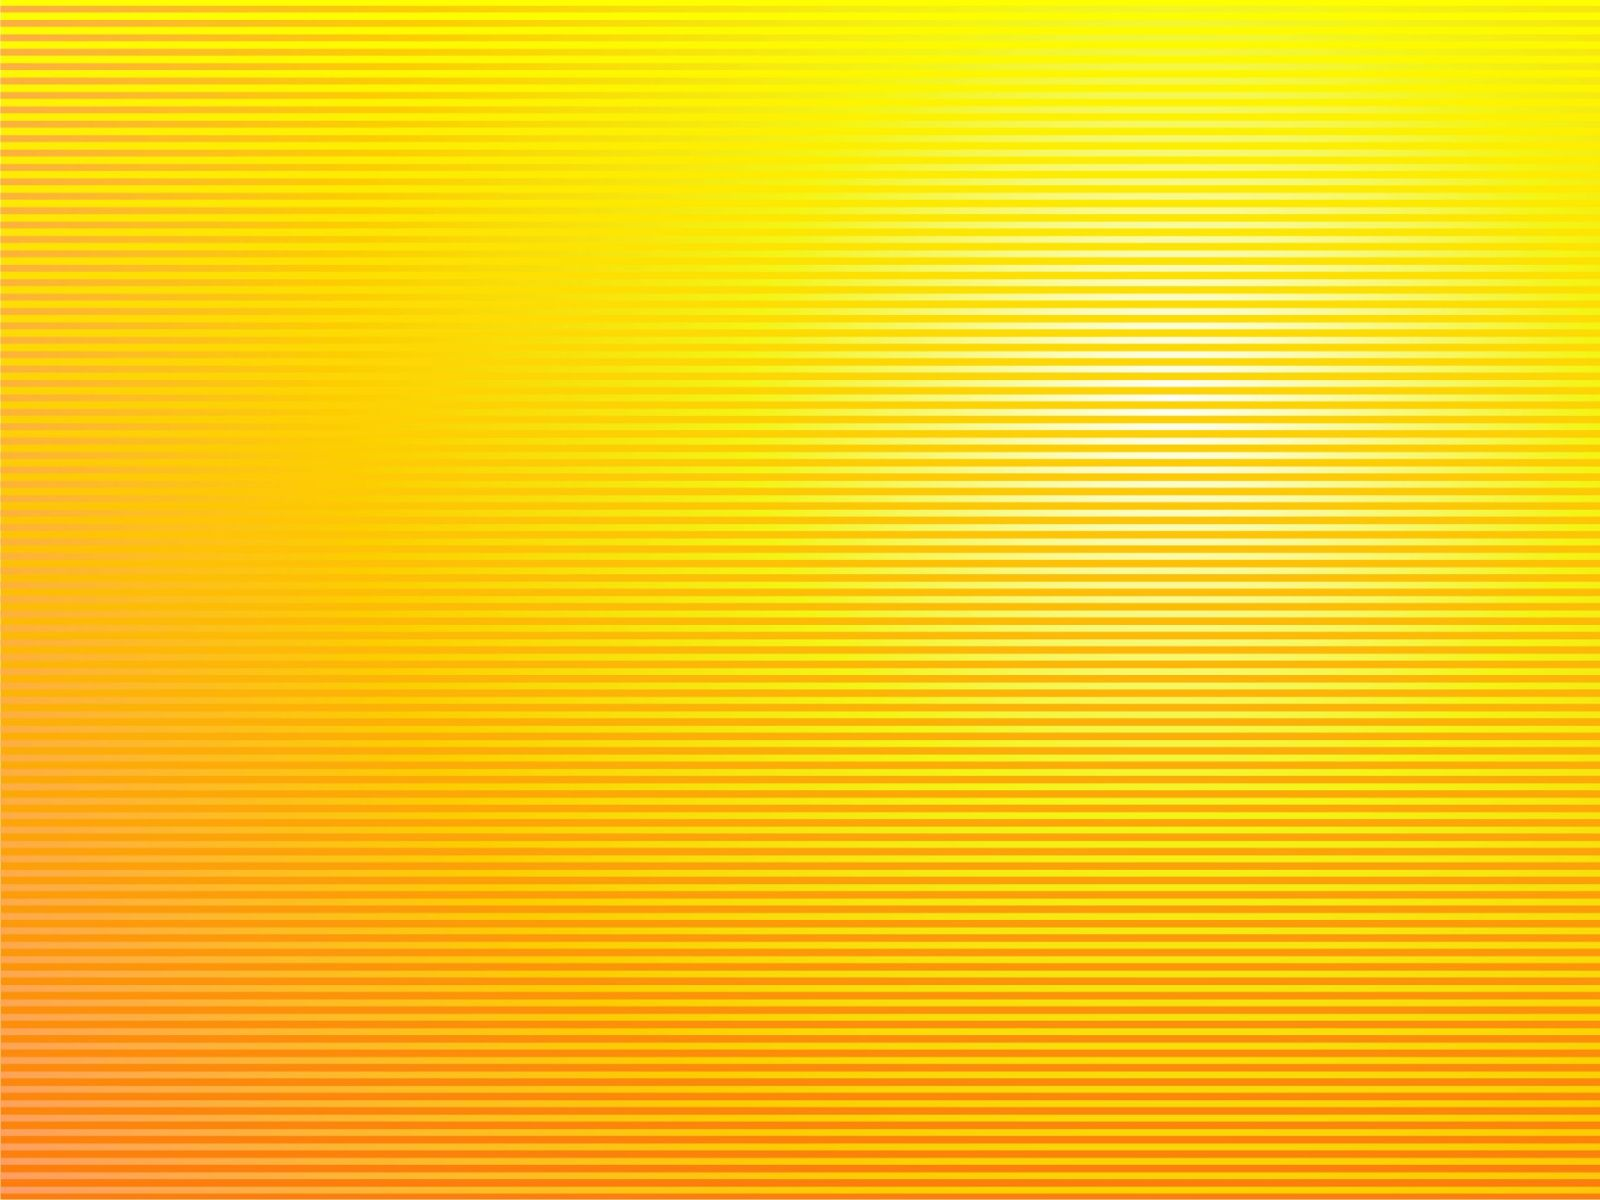 top desktop yellow wallpapers yellow wallpaper yellow background hd 8 1600x1200